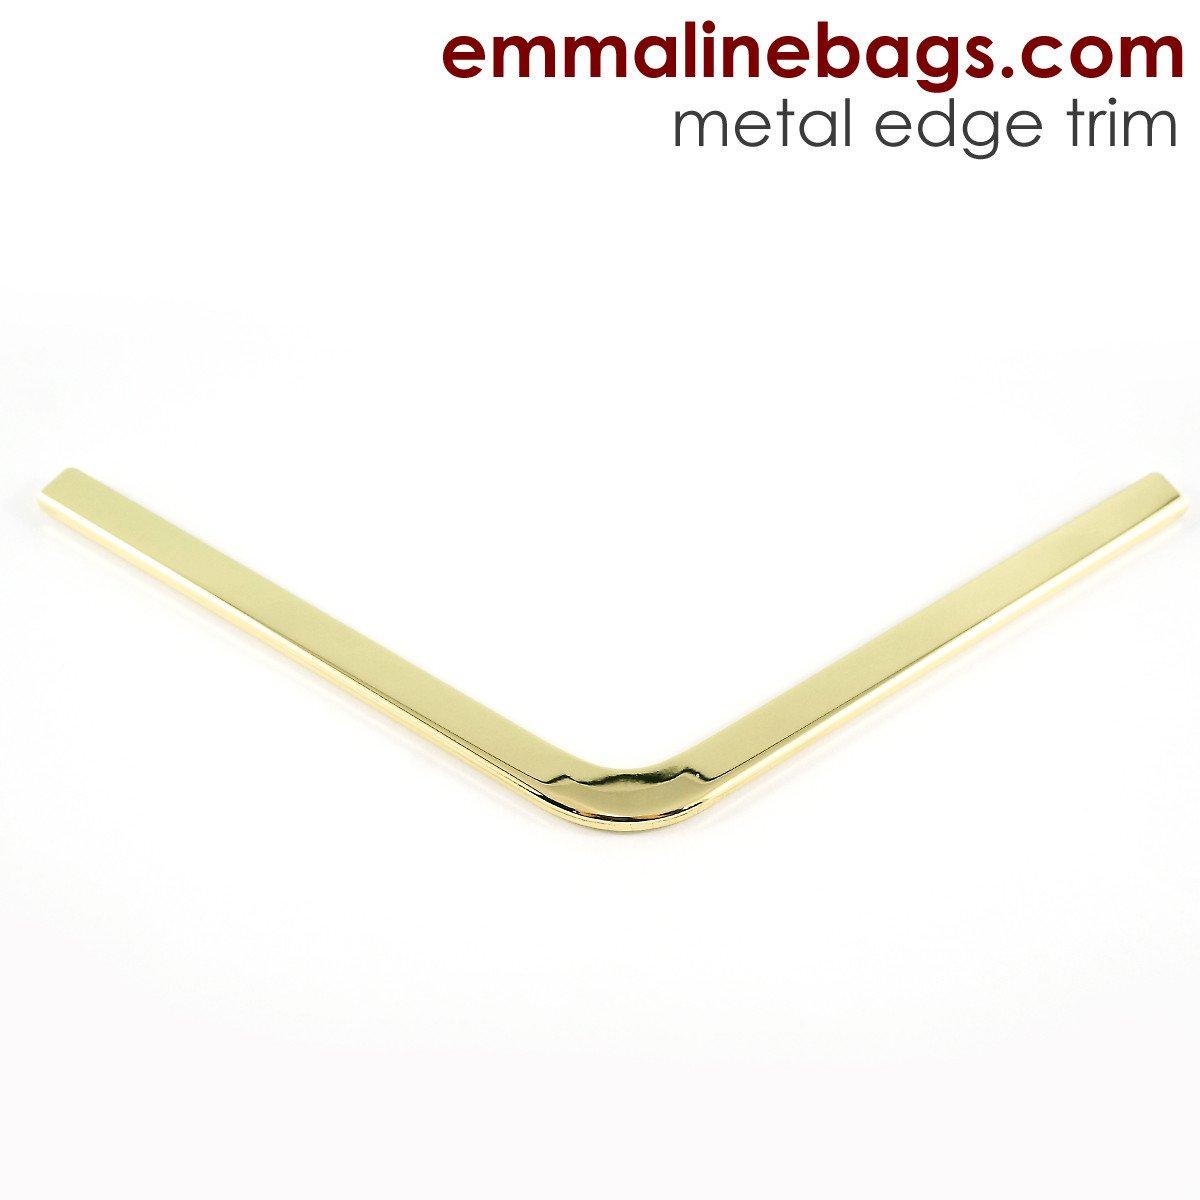 Emmaline - Metal Edge Trim A For Purses - Gold